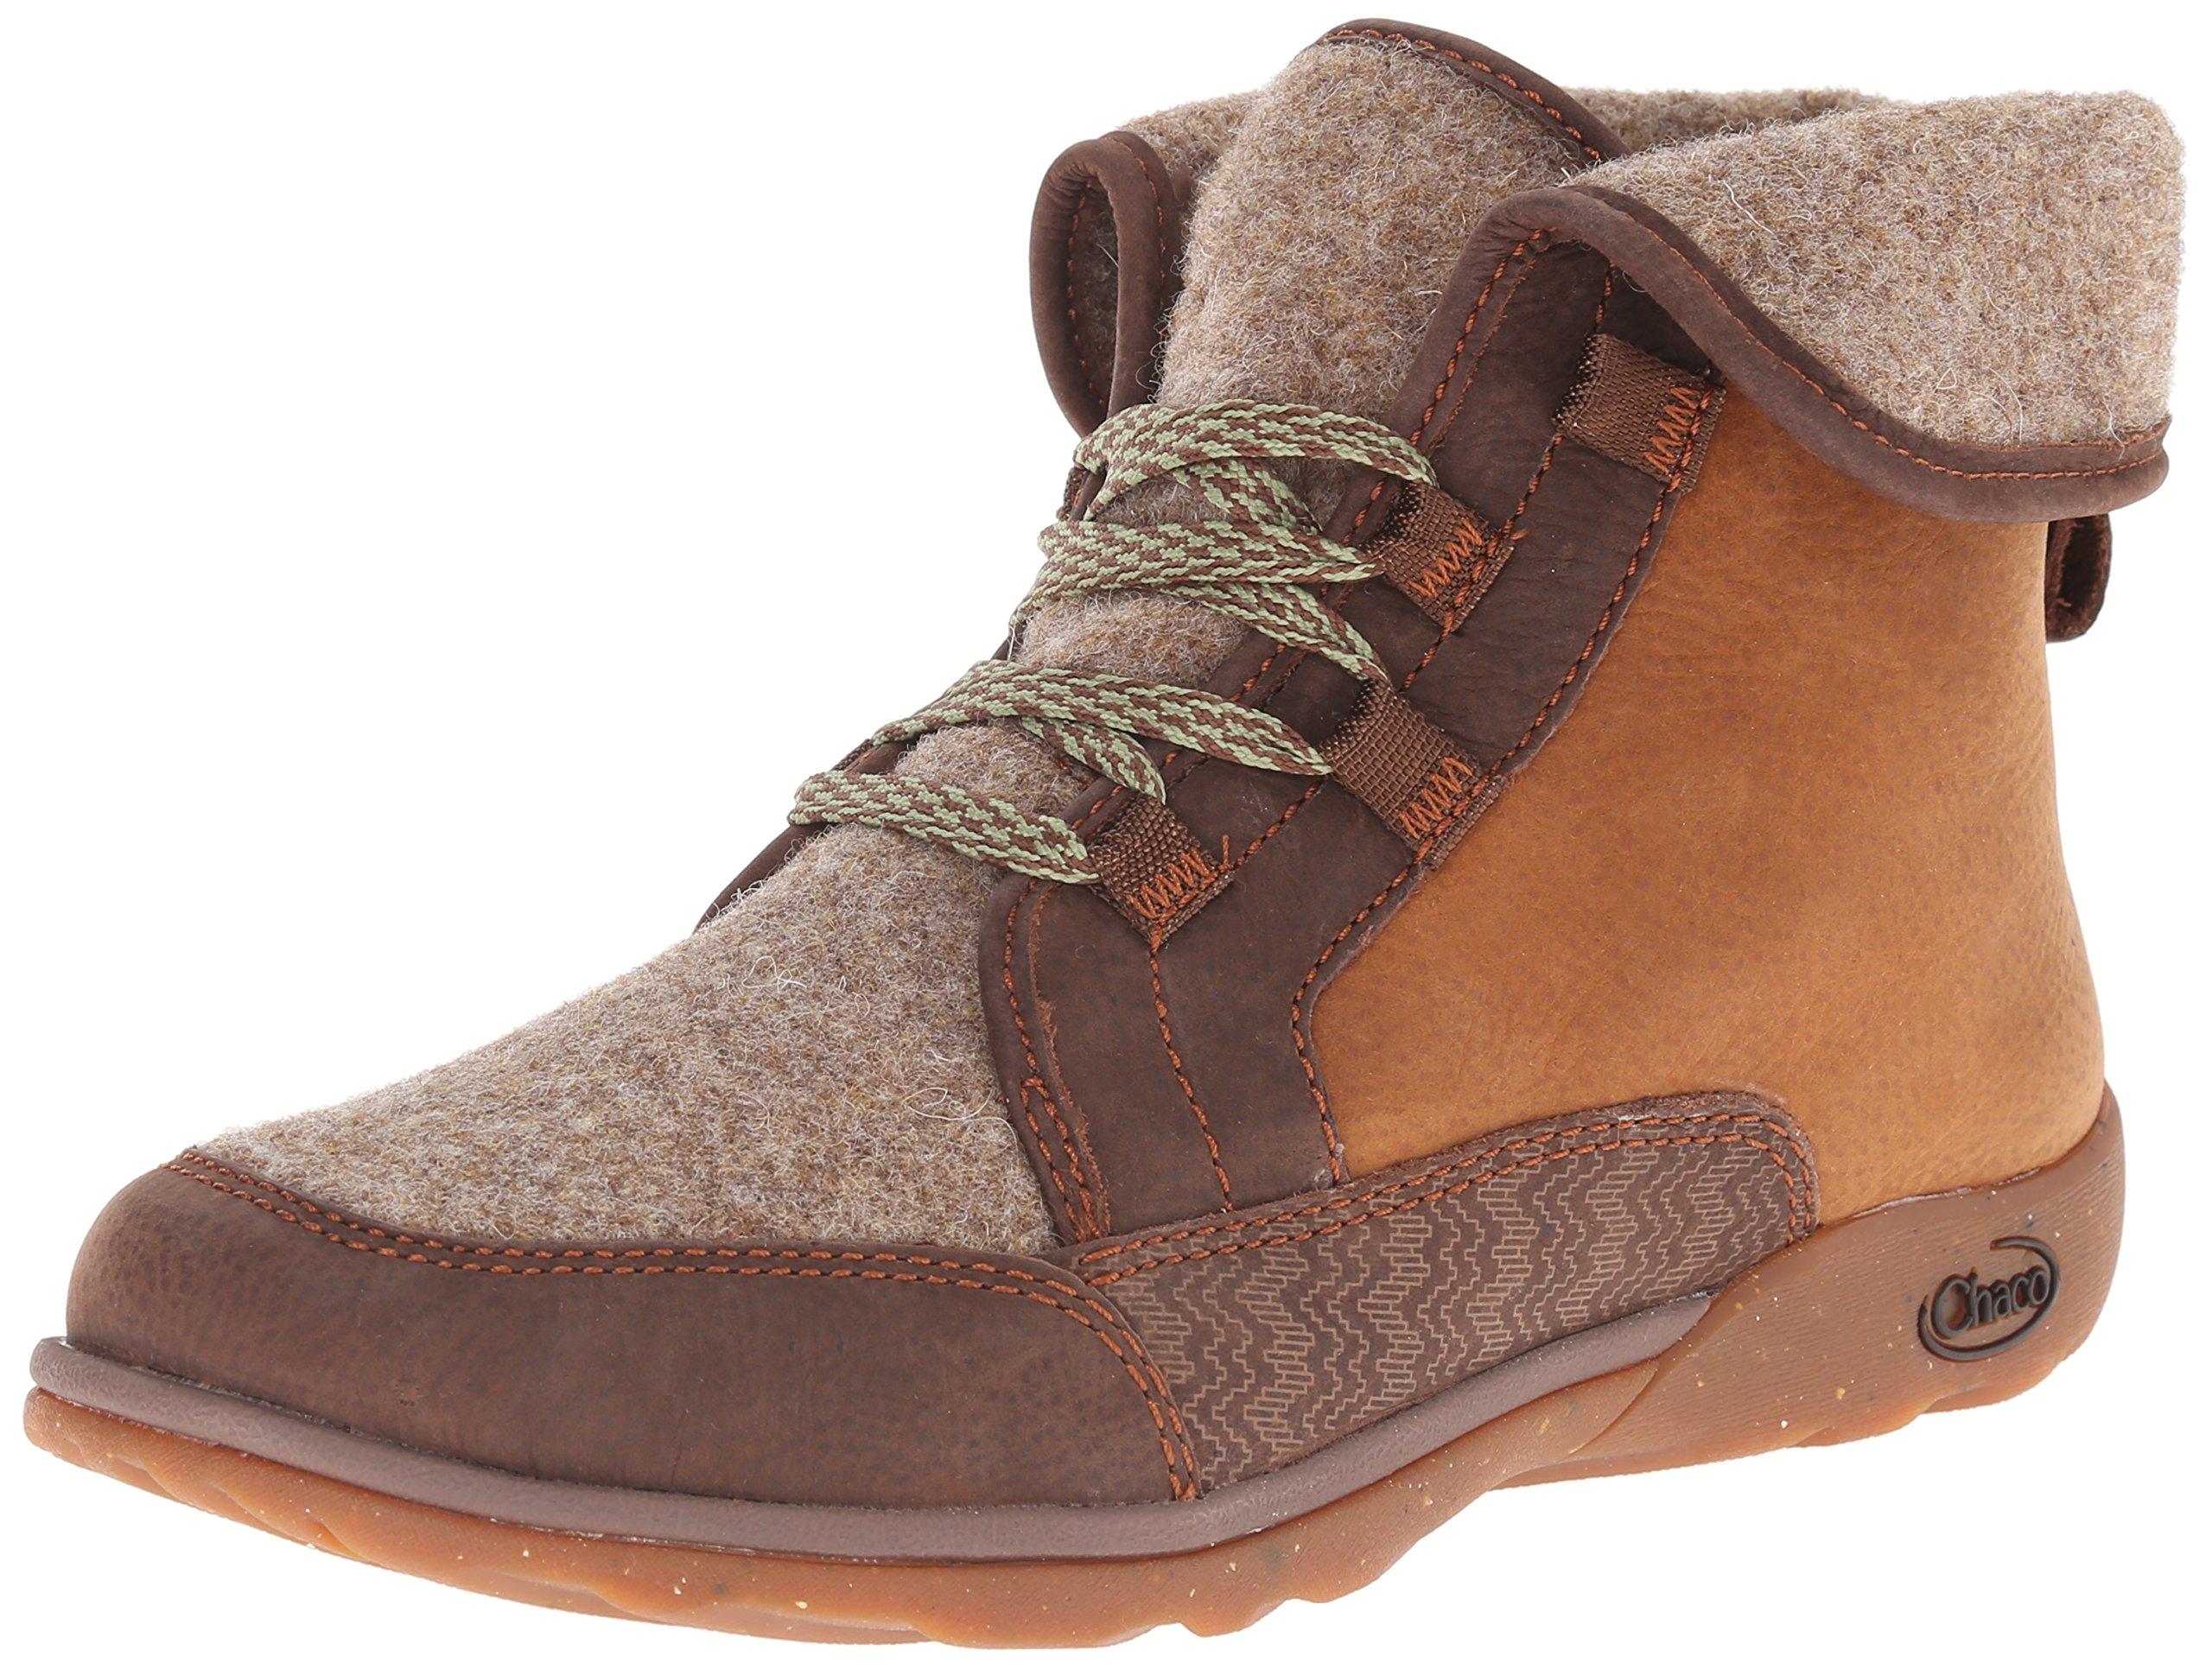 Chaco Women's Barbary Boot, Pinecone, 10 M US